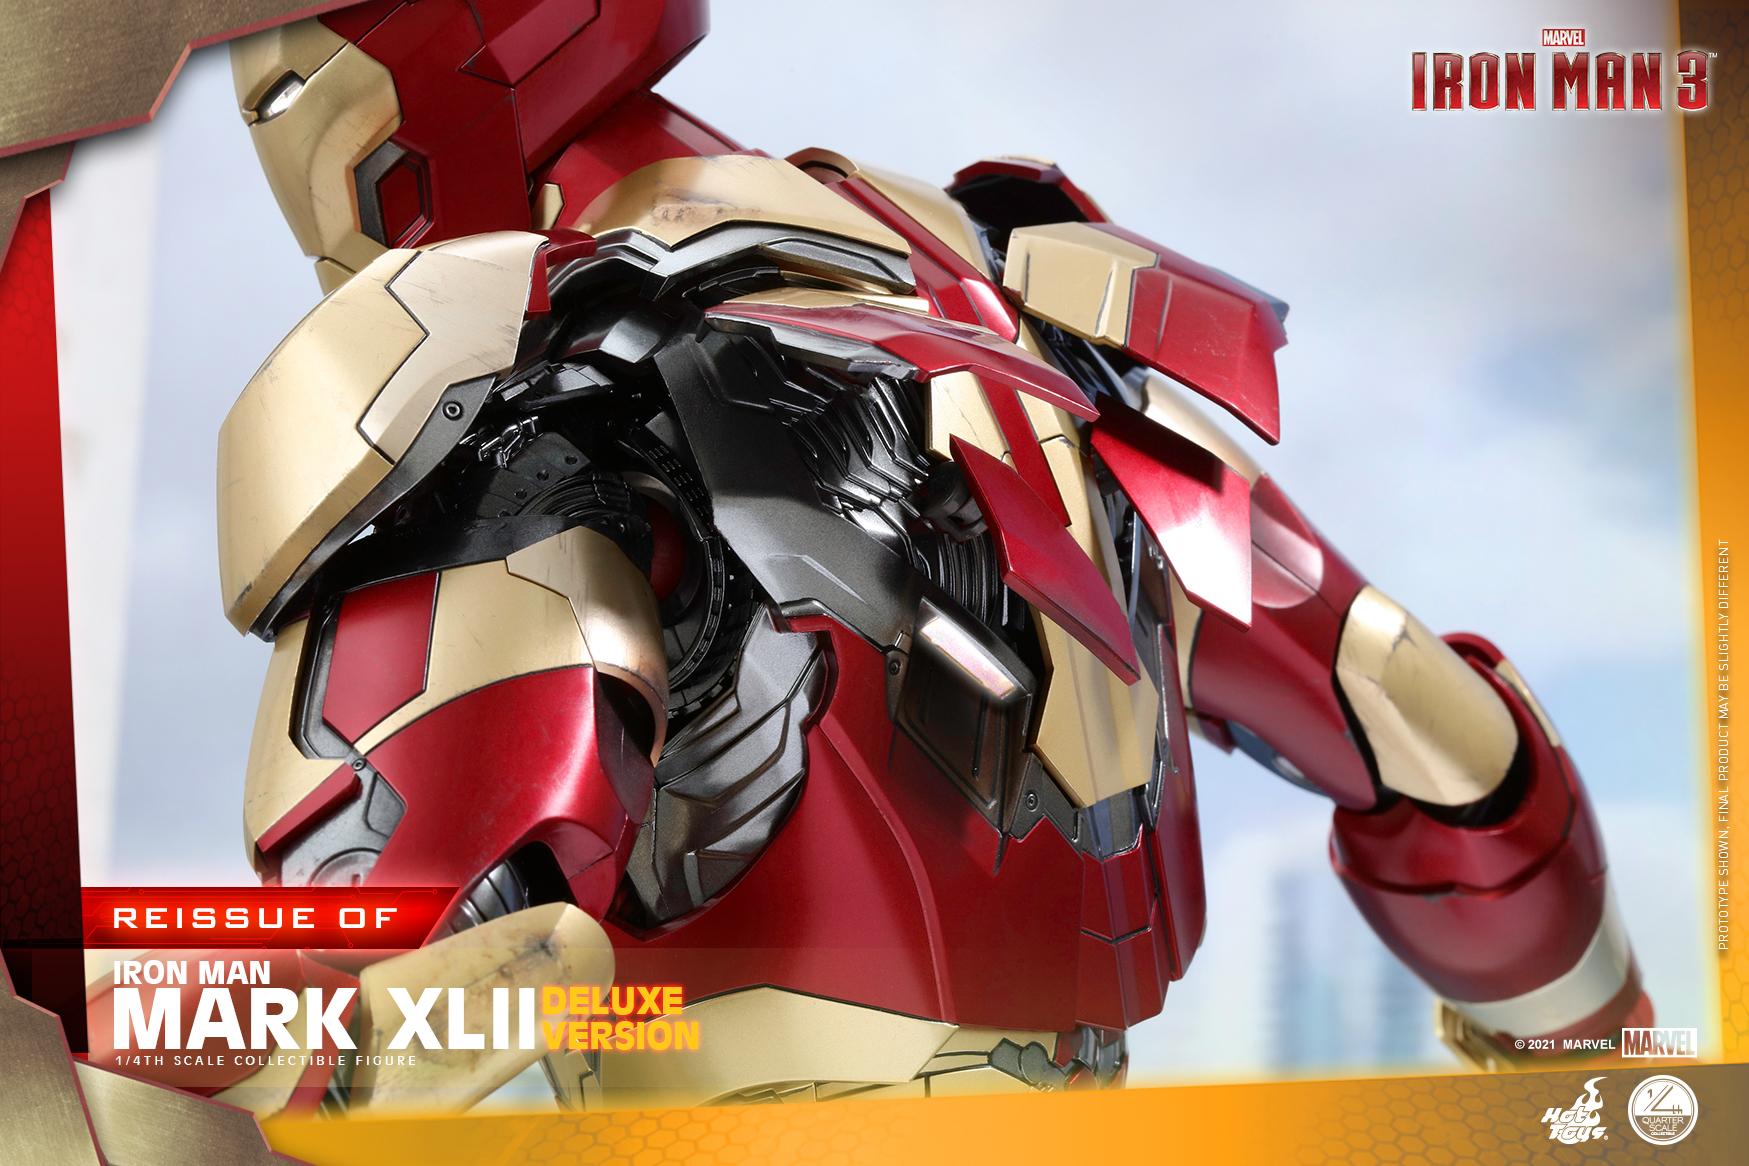 Hot Toys - Iron Man 3 - 1-4 Iron Man Mark XLII collectible figure_PR15